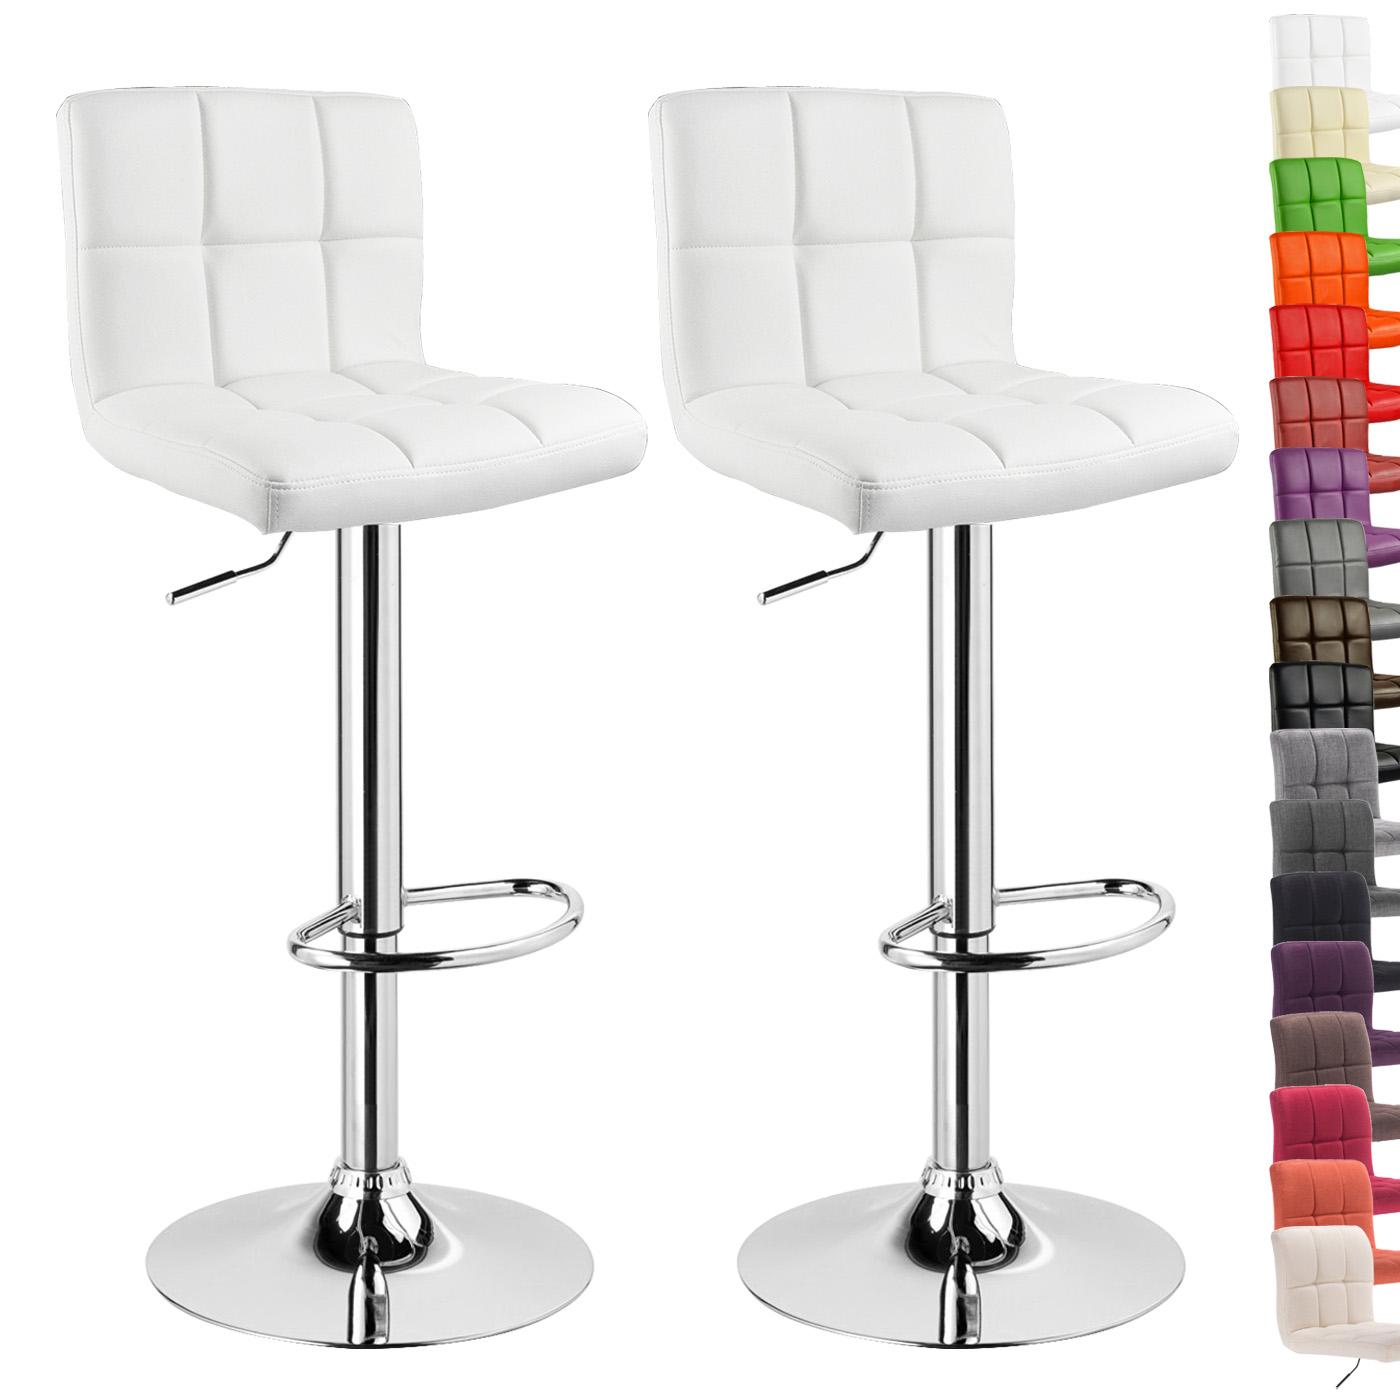 Tabourets de bar en pu lin avec dossier lot de 2 chaise - Tabouret de bar reglable avec dossier ...